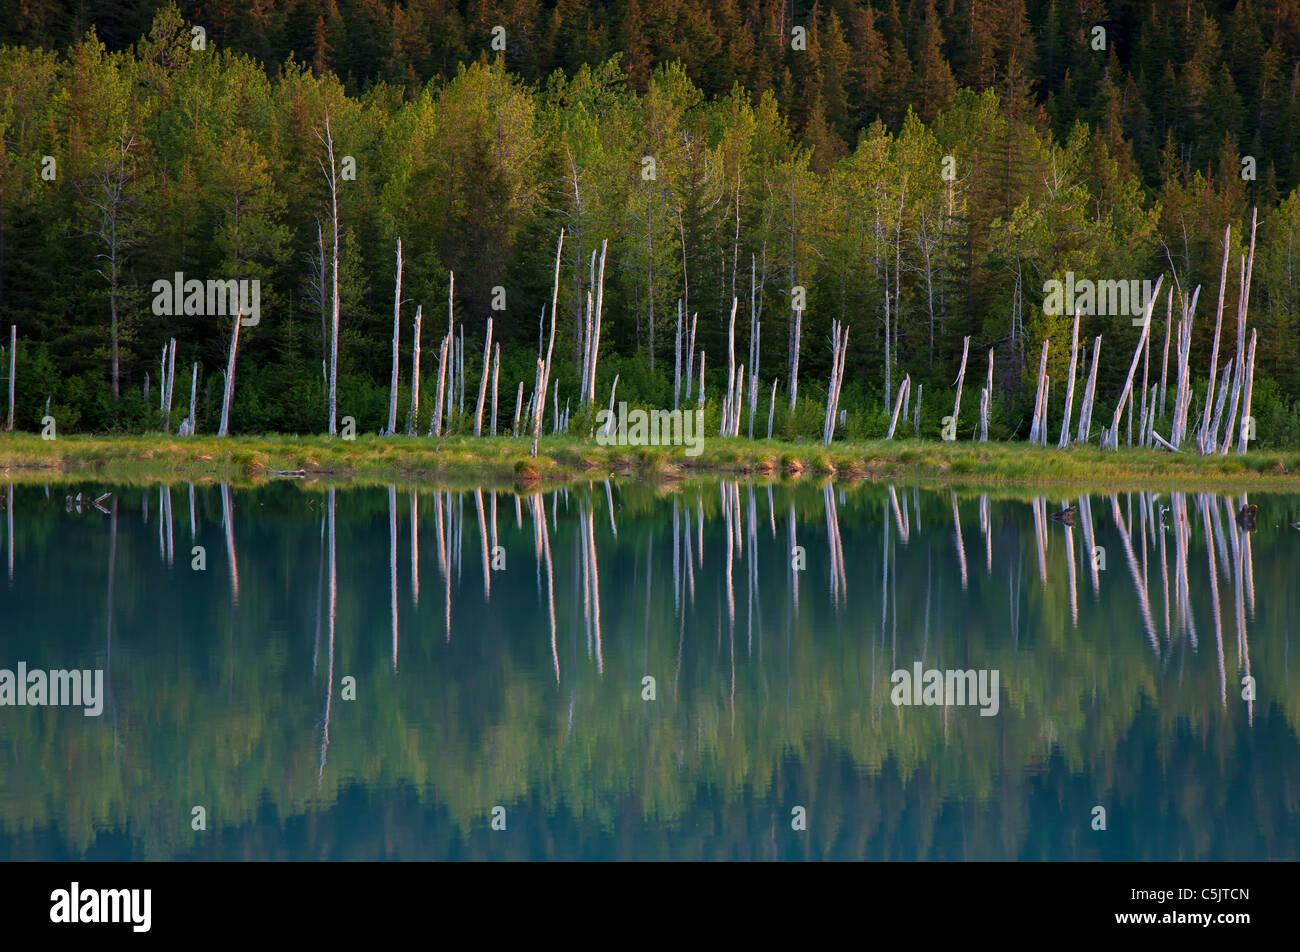 Portage Valley, Chugach National Forest, Alaska. - Stock Image